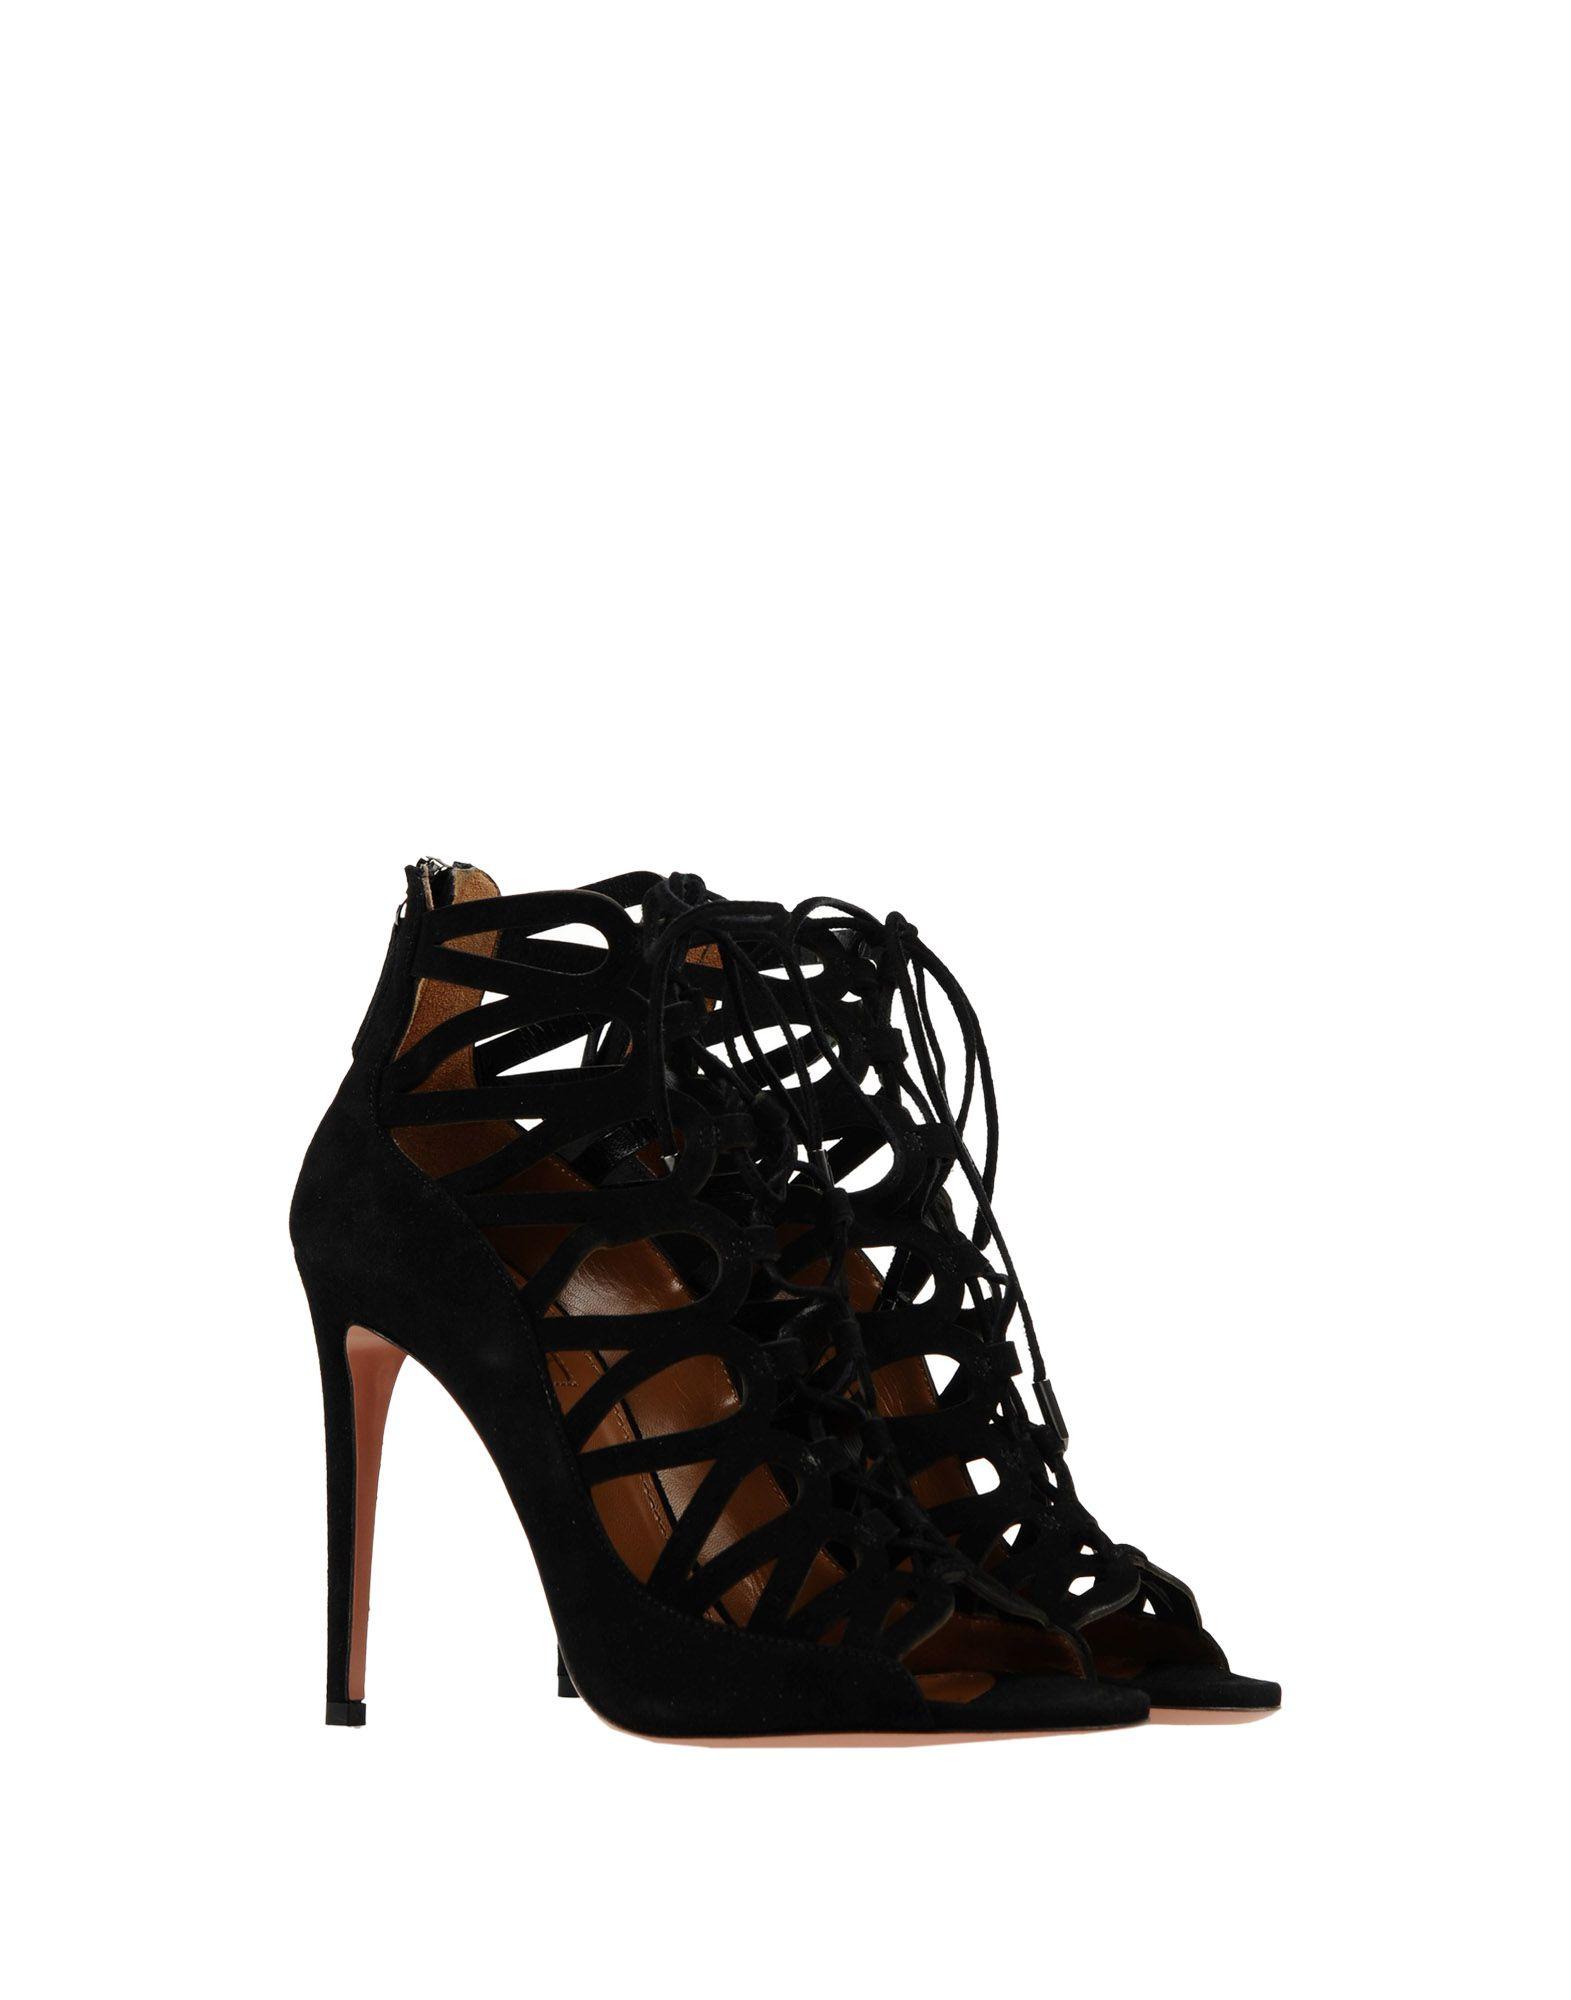 Aquazzura gut Sandalen Damen  11404172GSGünstige gut Aquazzura aussehende Schuhe 600b59